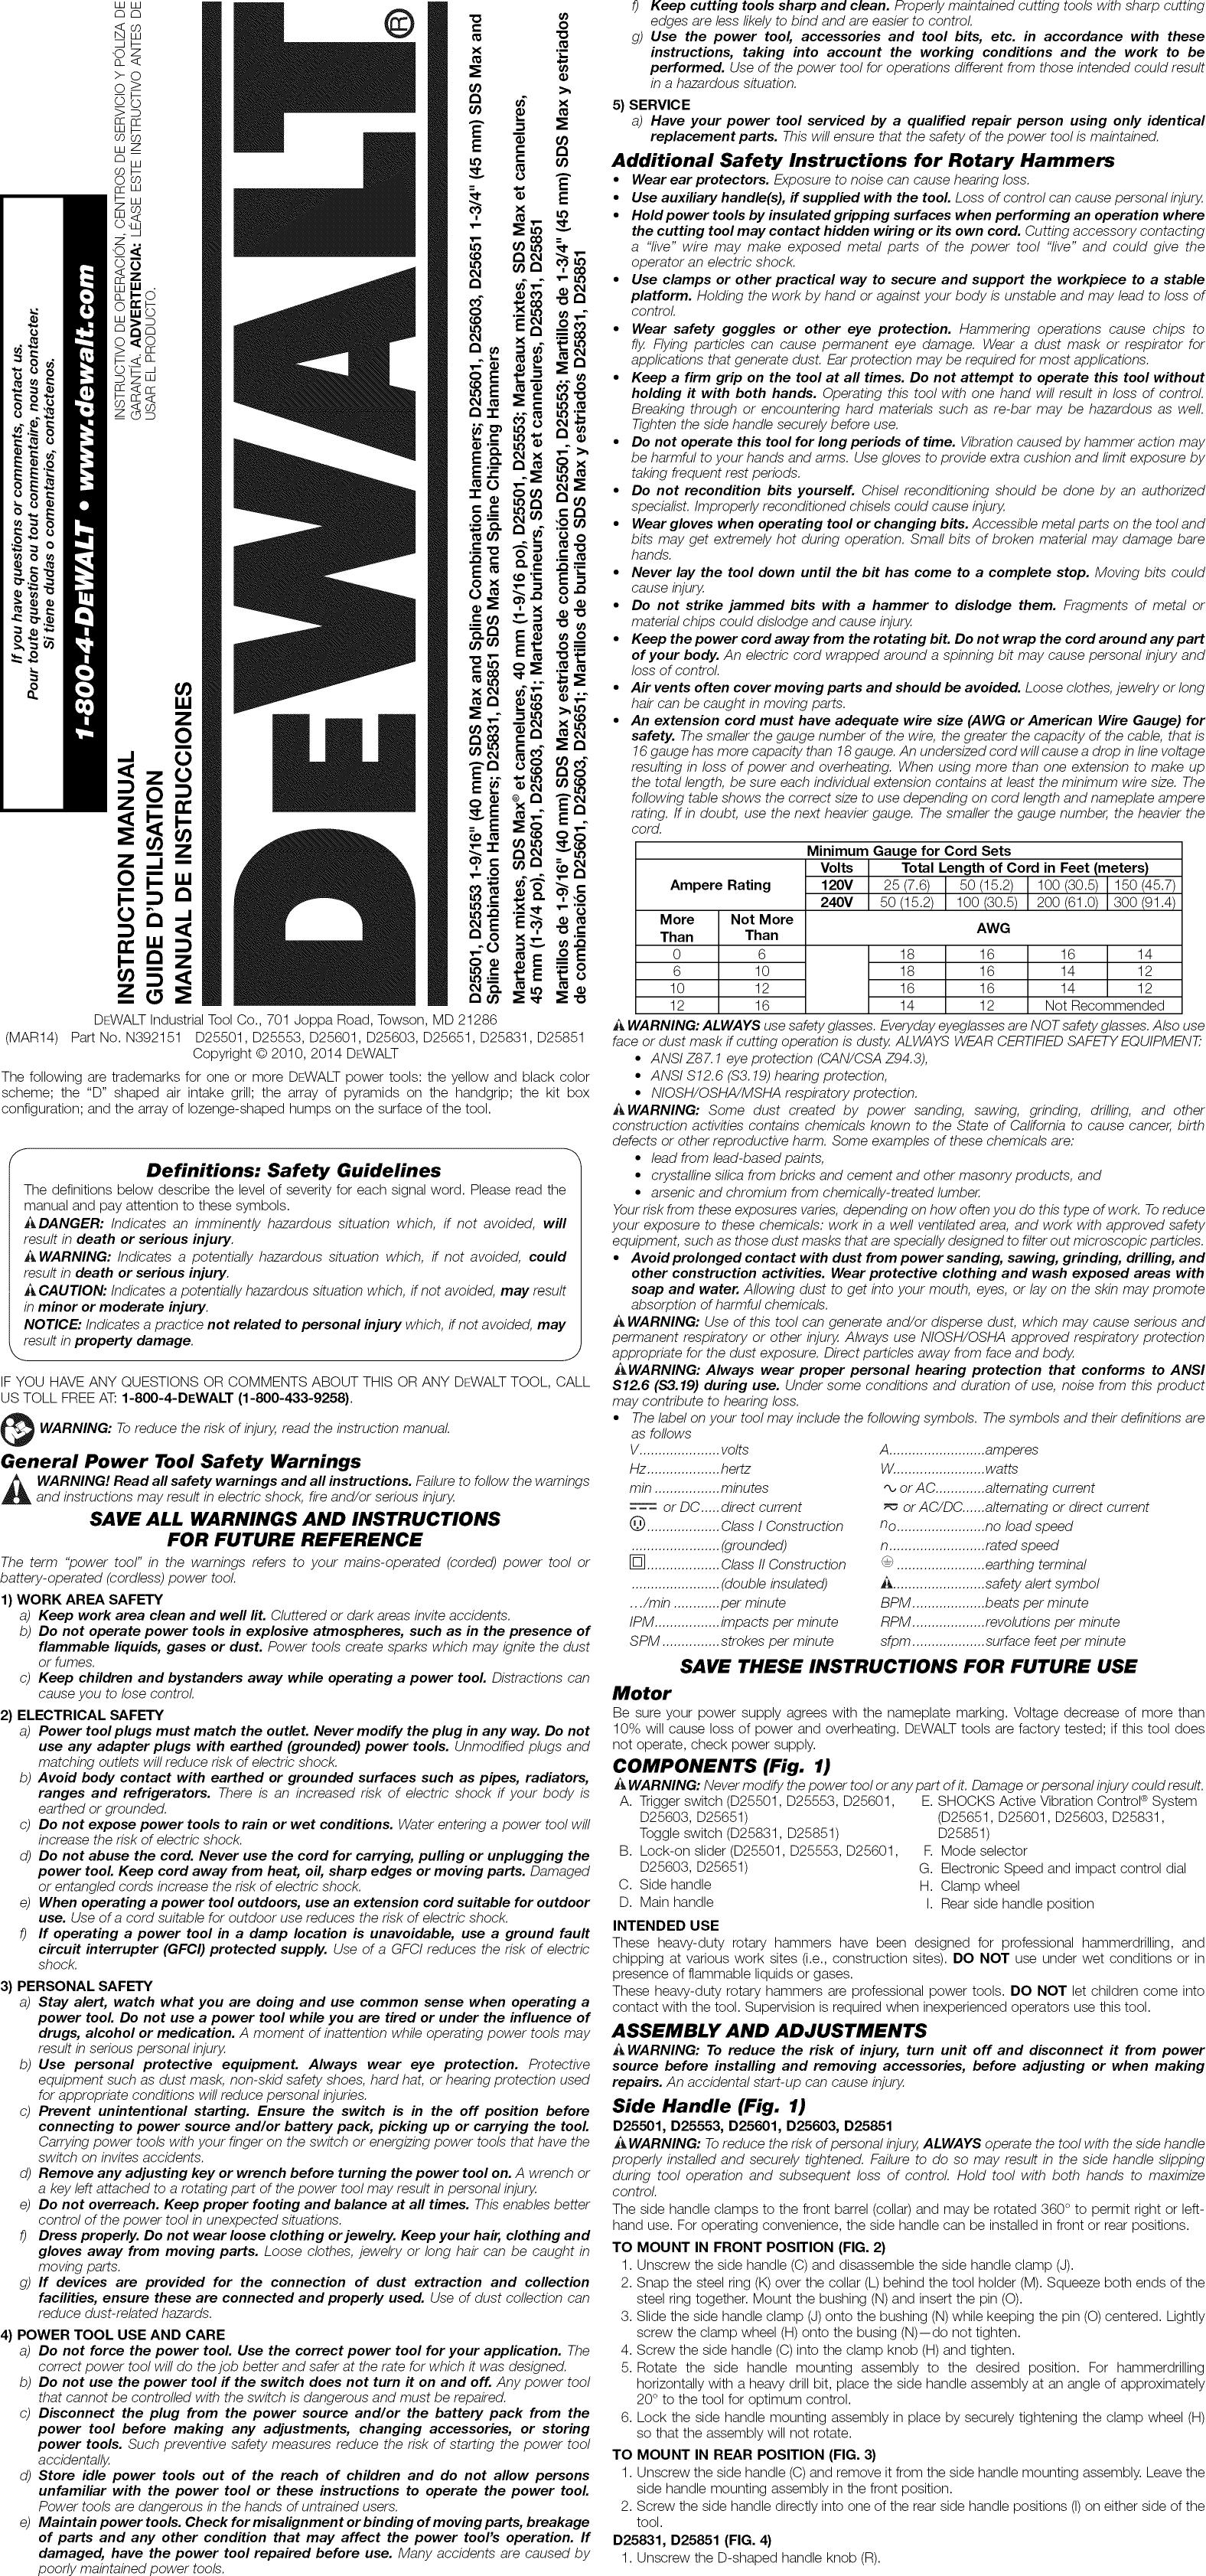 Aeromotive 16301 Manual Guide